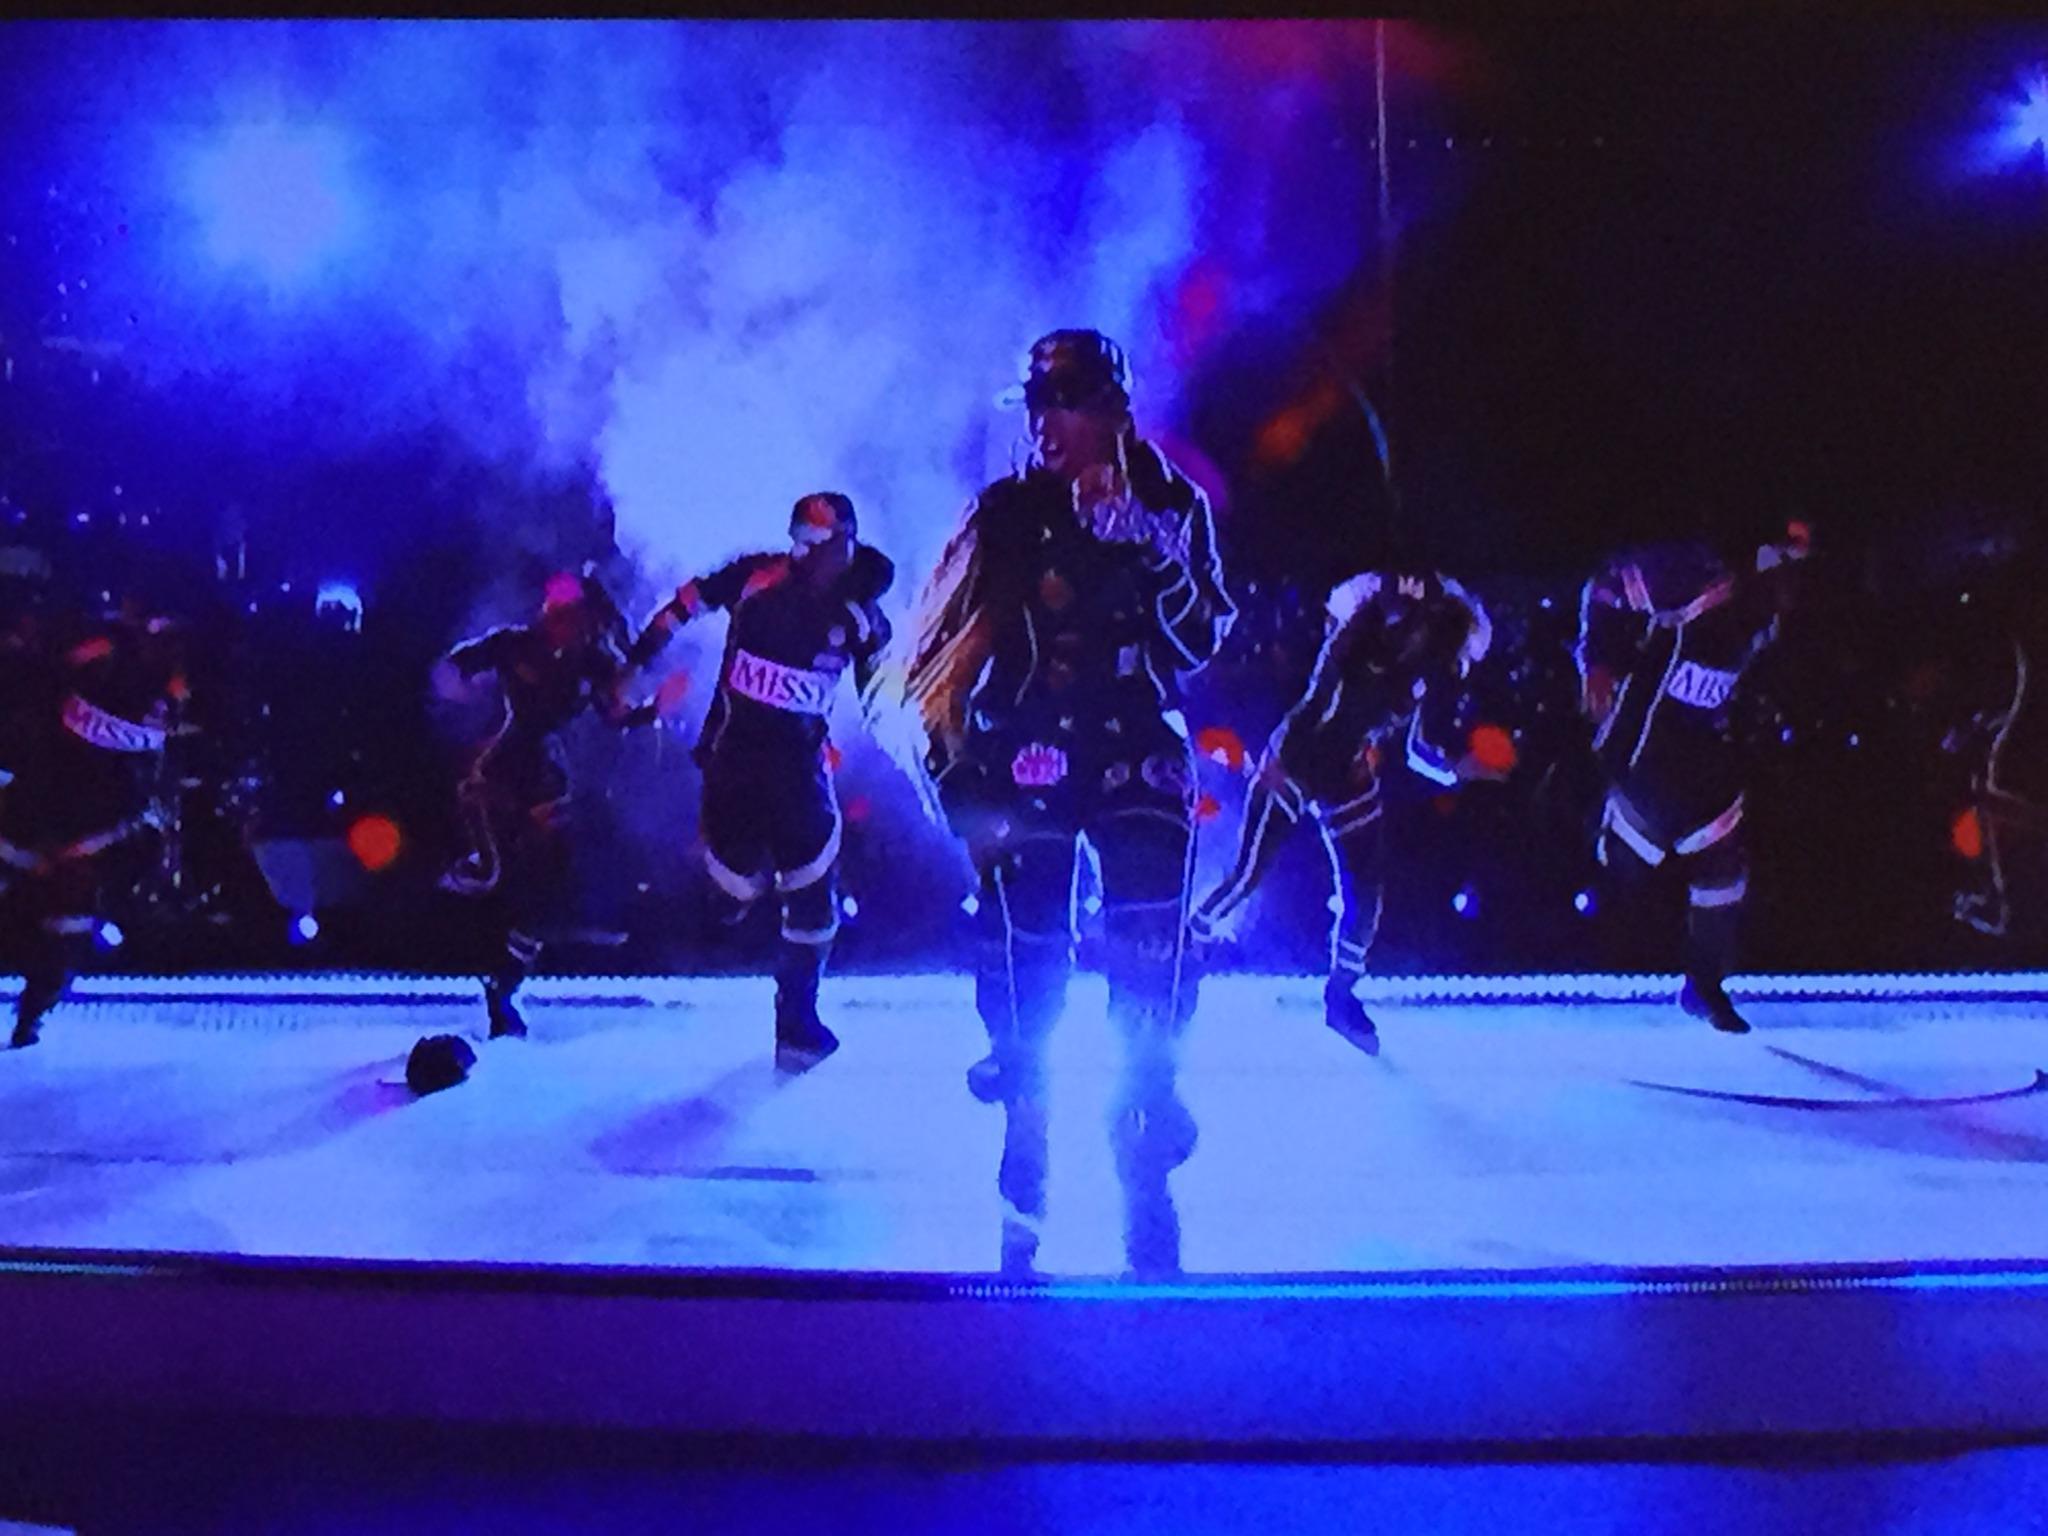 Missy Elliott is killing it! #musicmakeyoulosecontrol #SuperBowl #HalftimeShow http://t.co/JIYNP8r4Eu